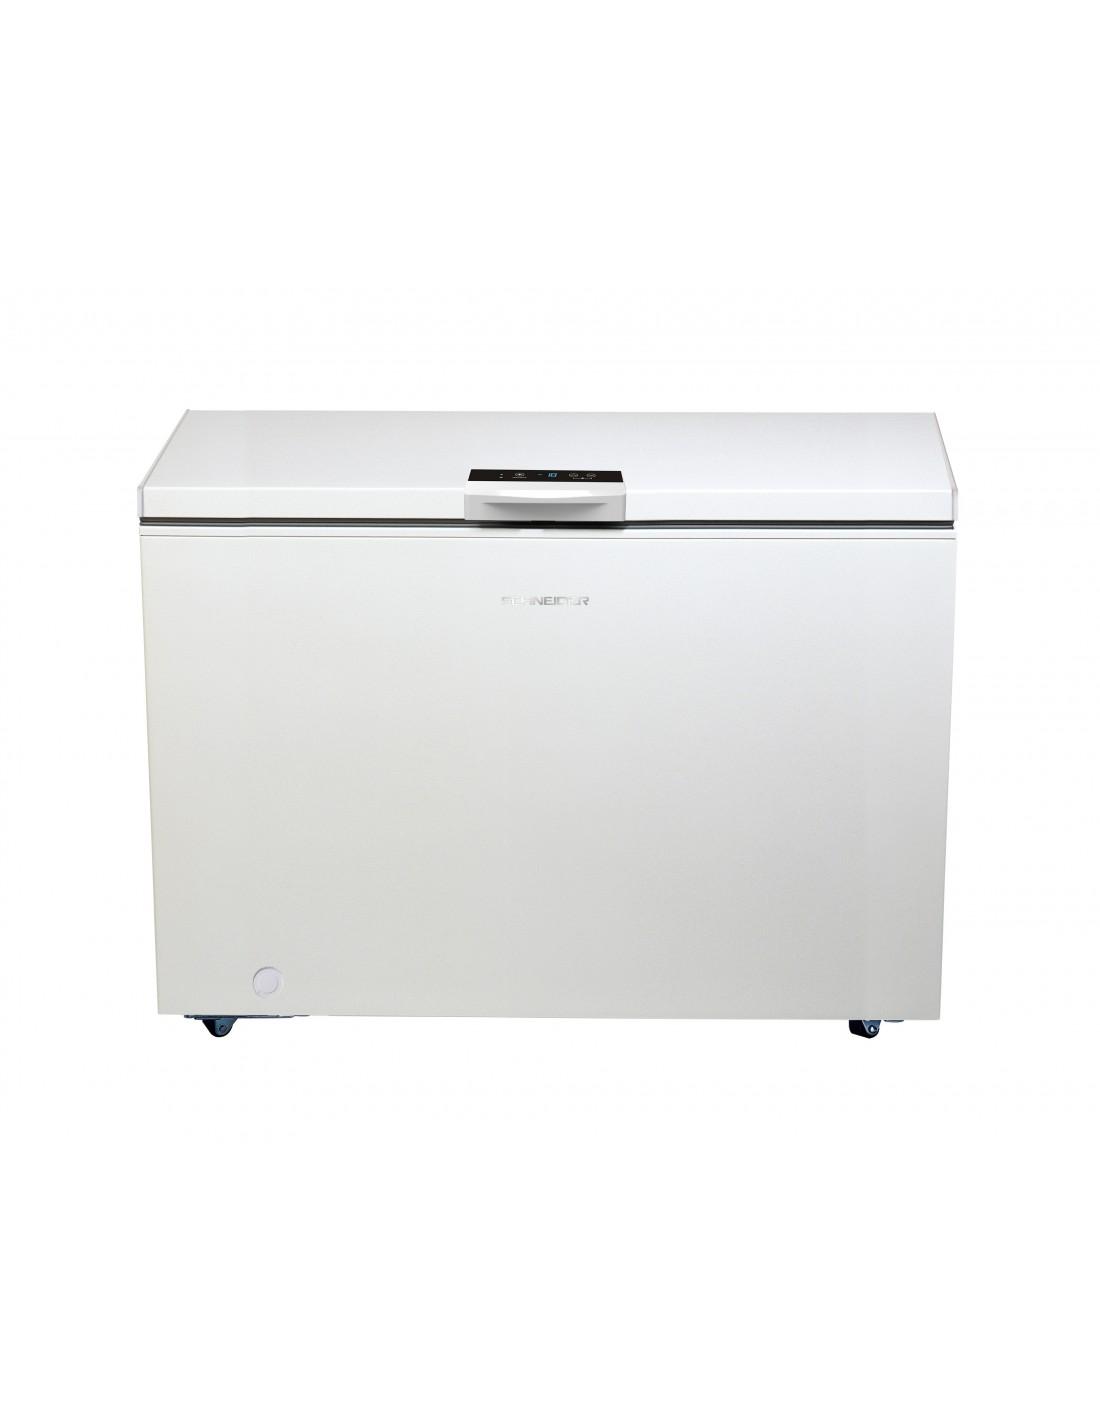 http://www.promo-electro.fr/1587-thickbox_default/poele-forza-ceramique-fagor-forza28.jpg